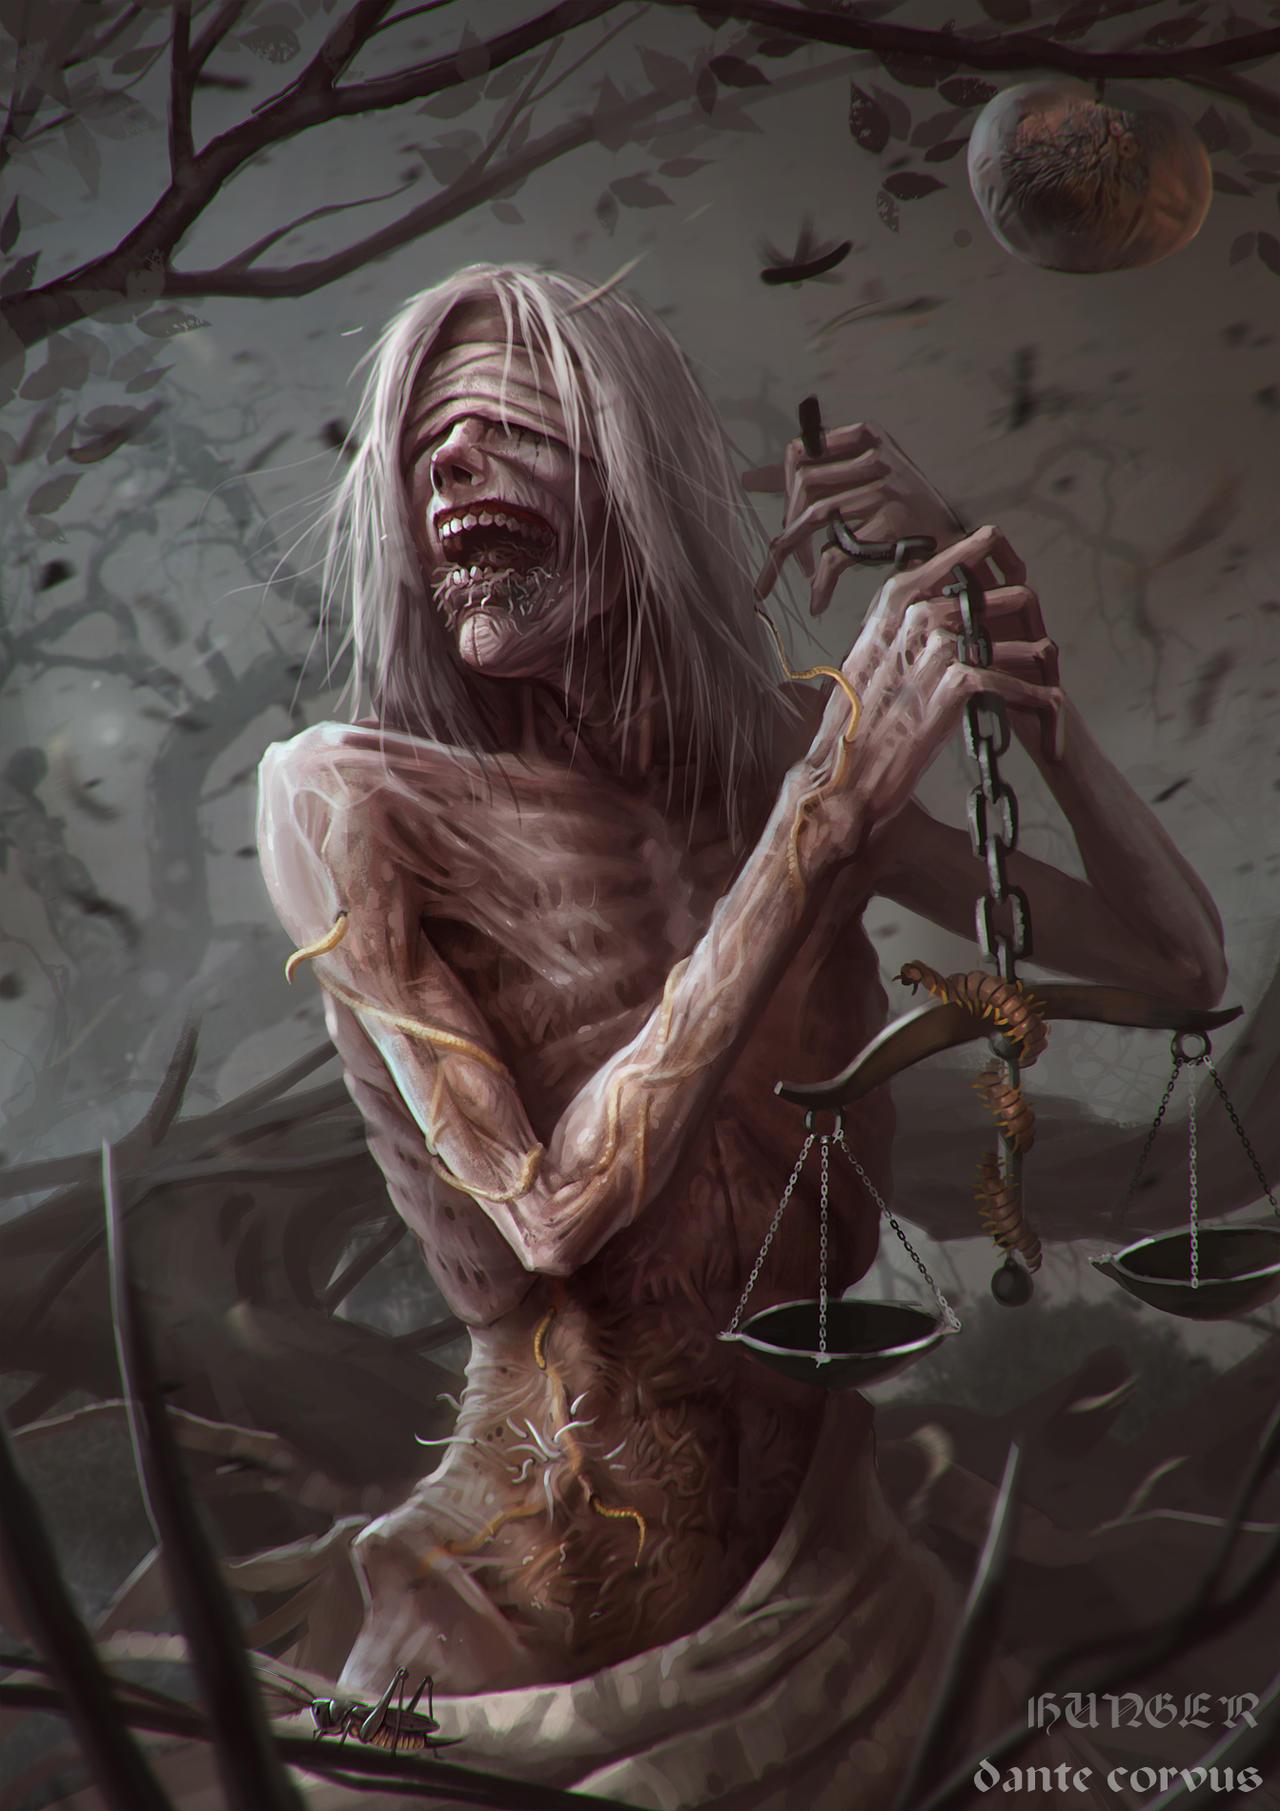 Four Horsemen Of The Apocalypse Pestilence - More info